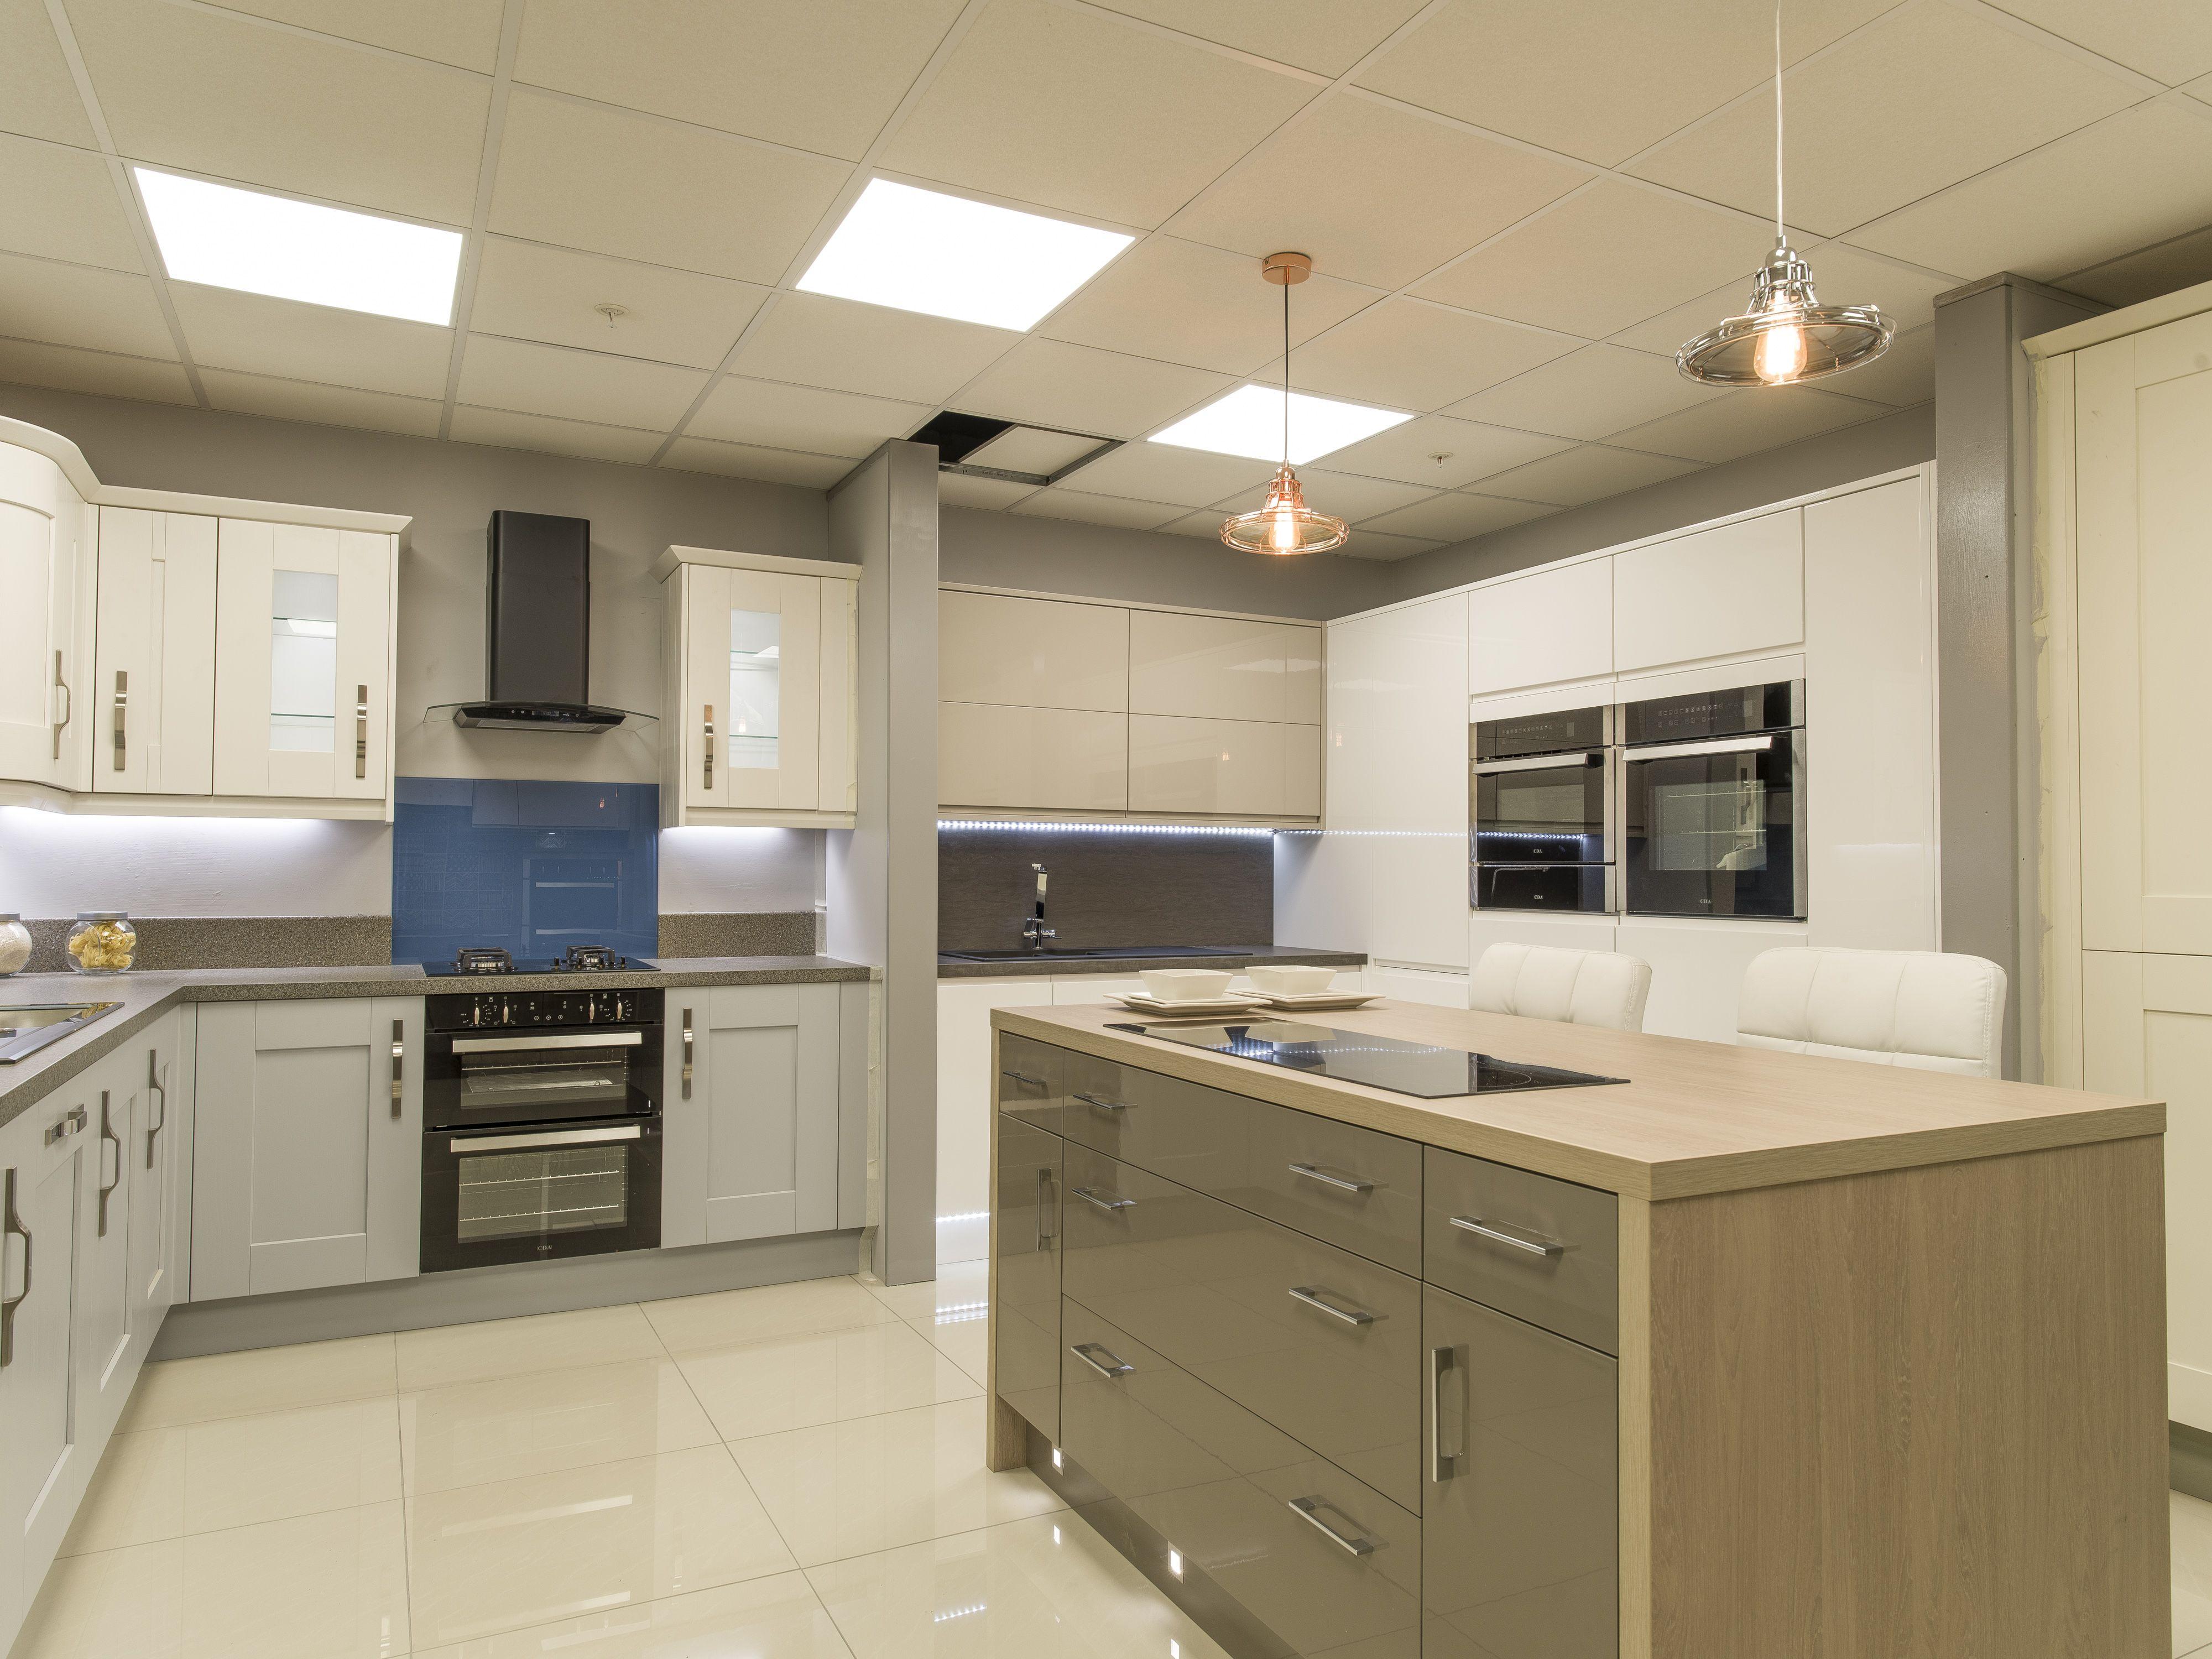 Buildbase Kitchen Showrooms Kitchen Kitchen Showroom Kitchen Cabinets